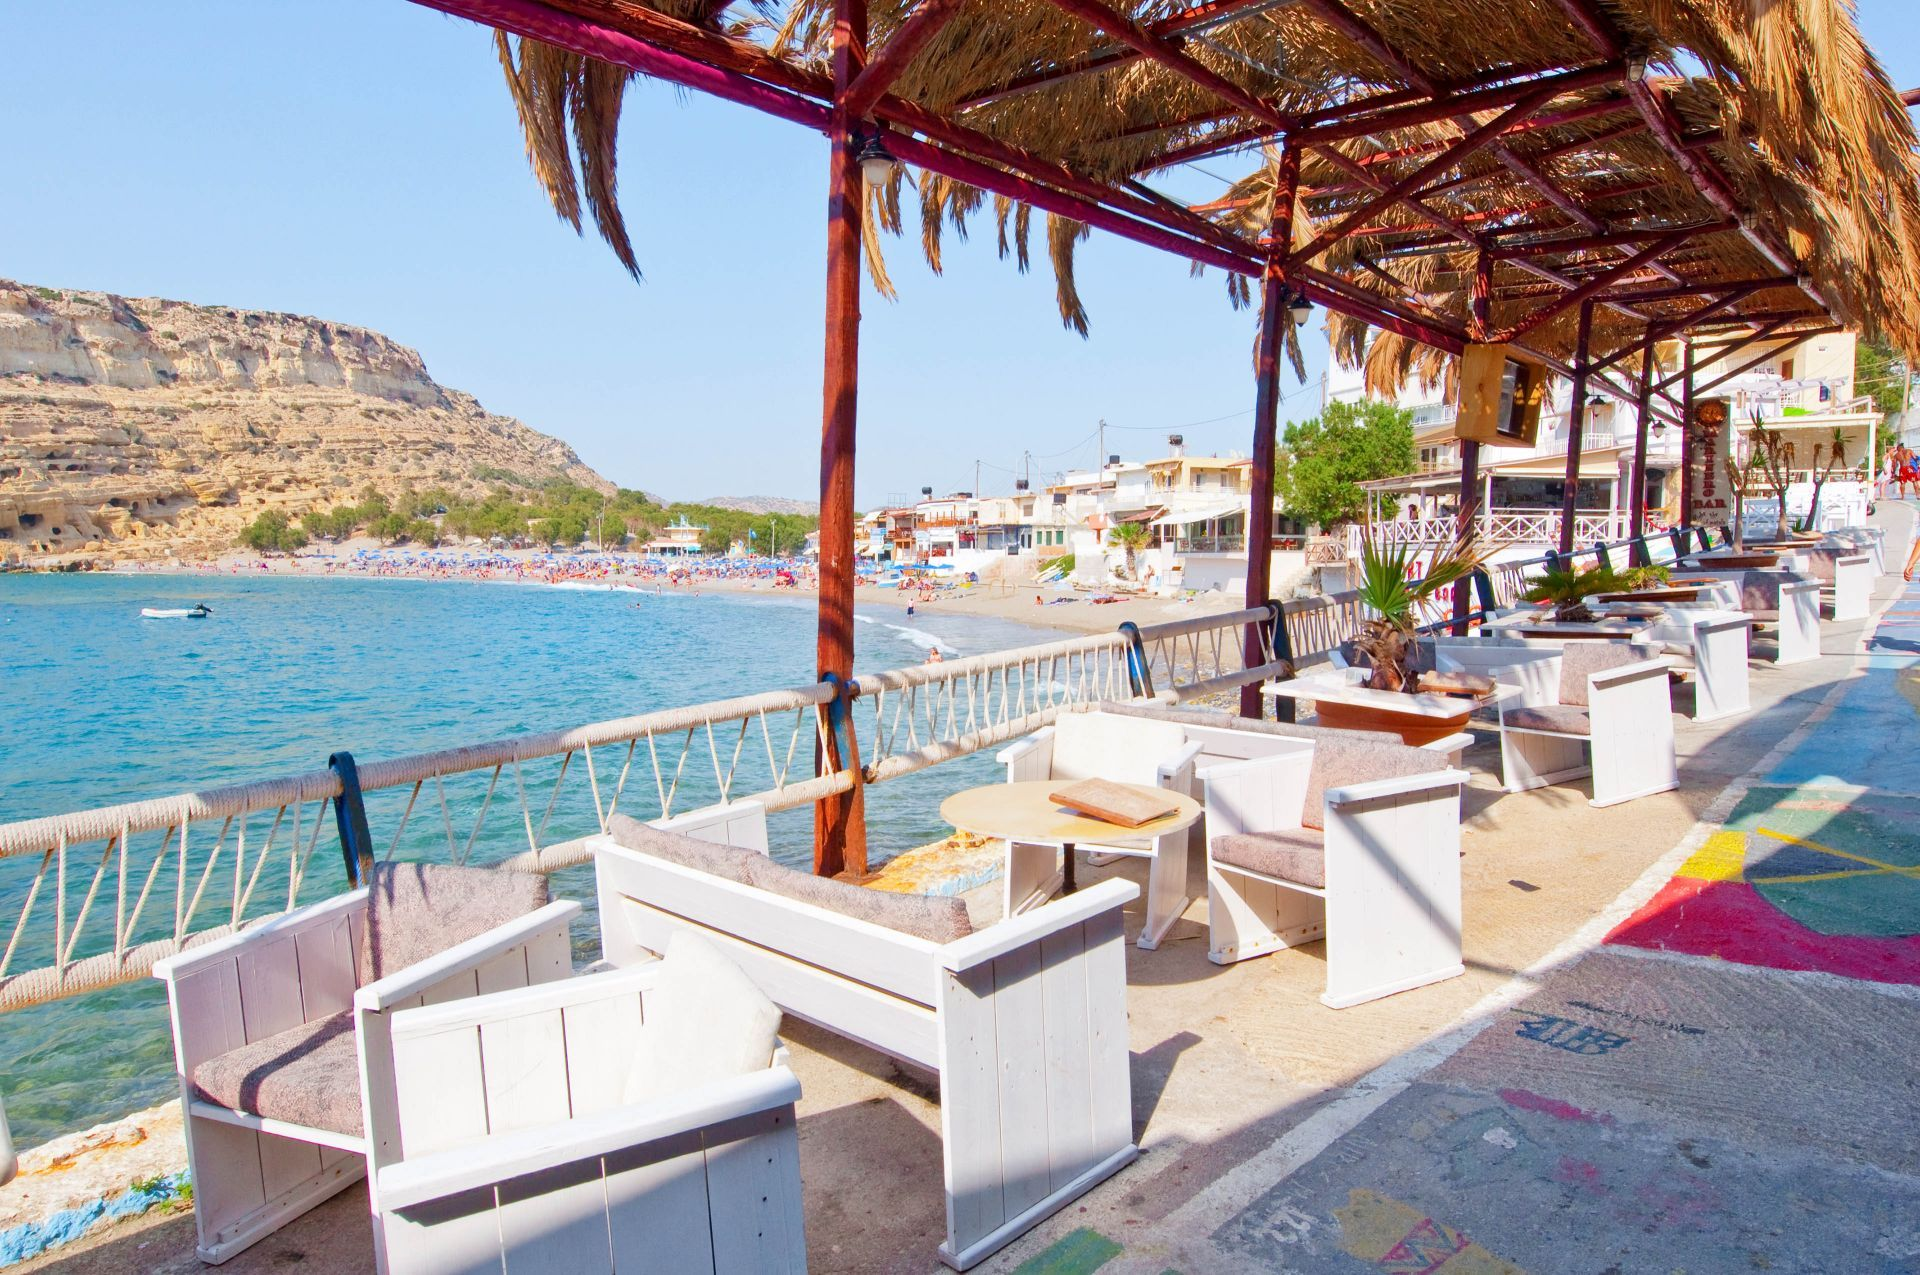 Cafes in Heraklion